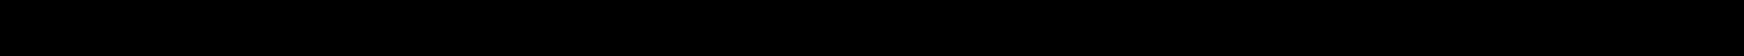 cf_blastgothic_mini-webfont.ttf